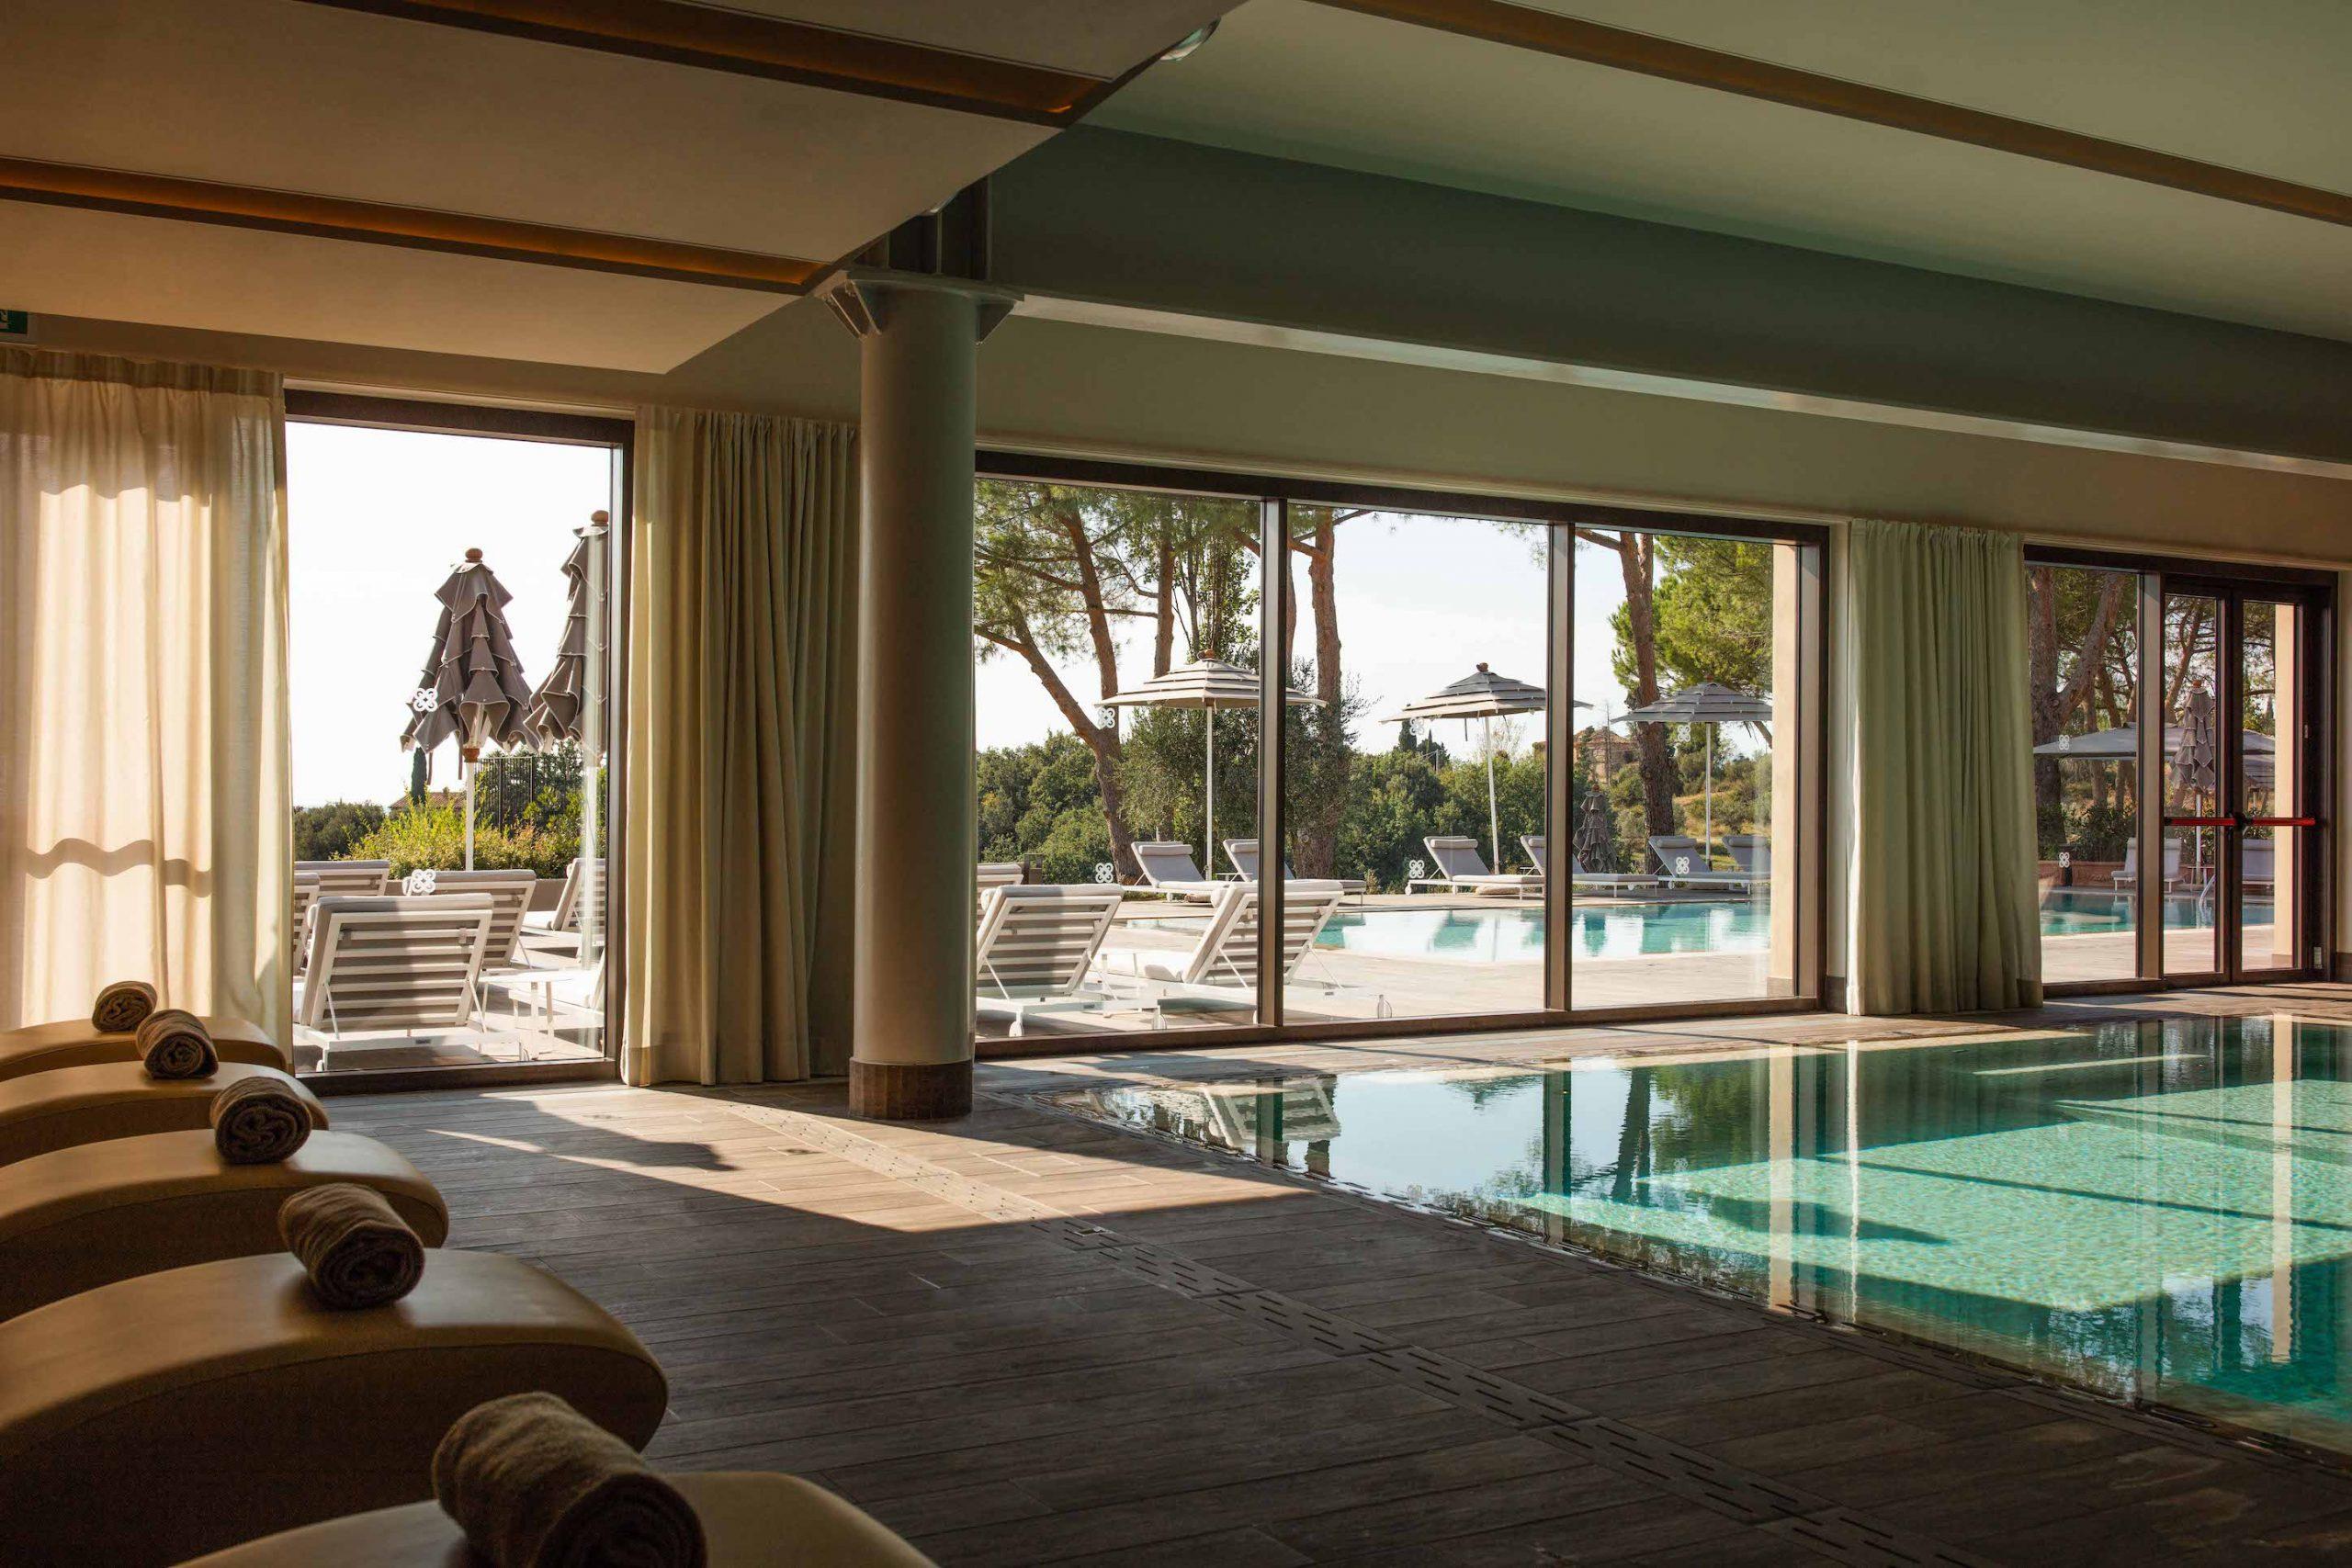 castelfalfi-resort-spa-experience-italy4golf